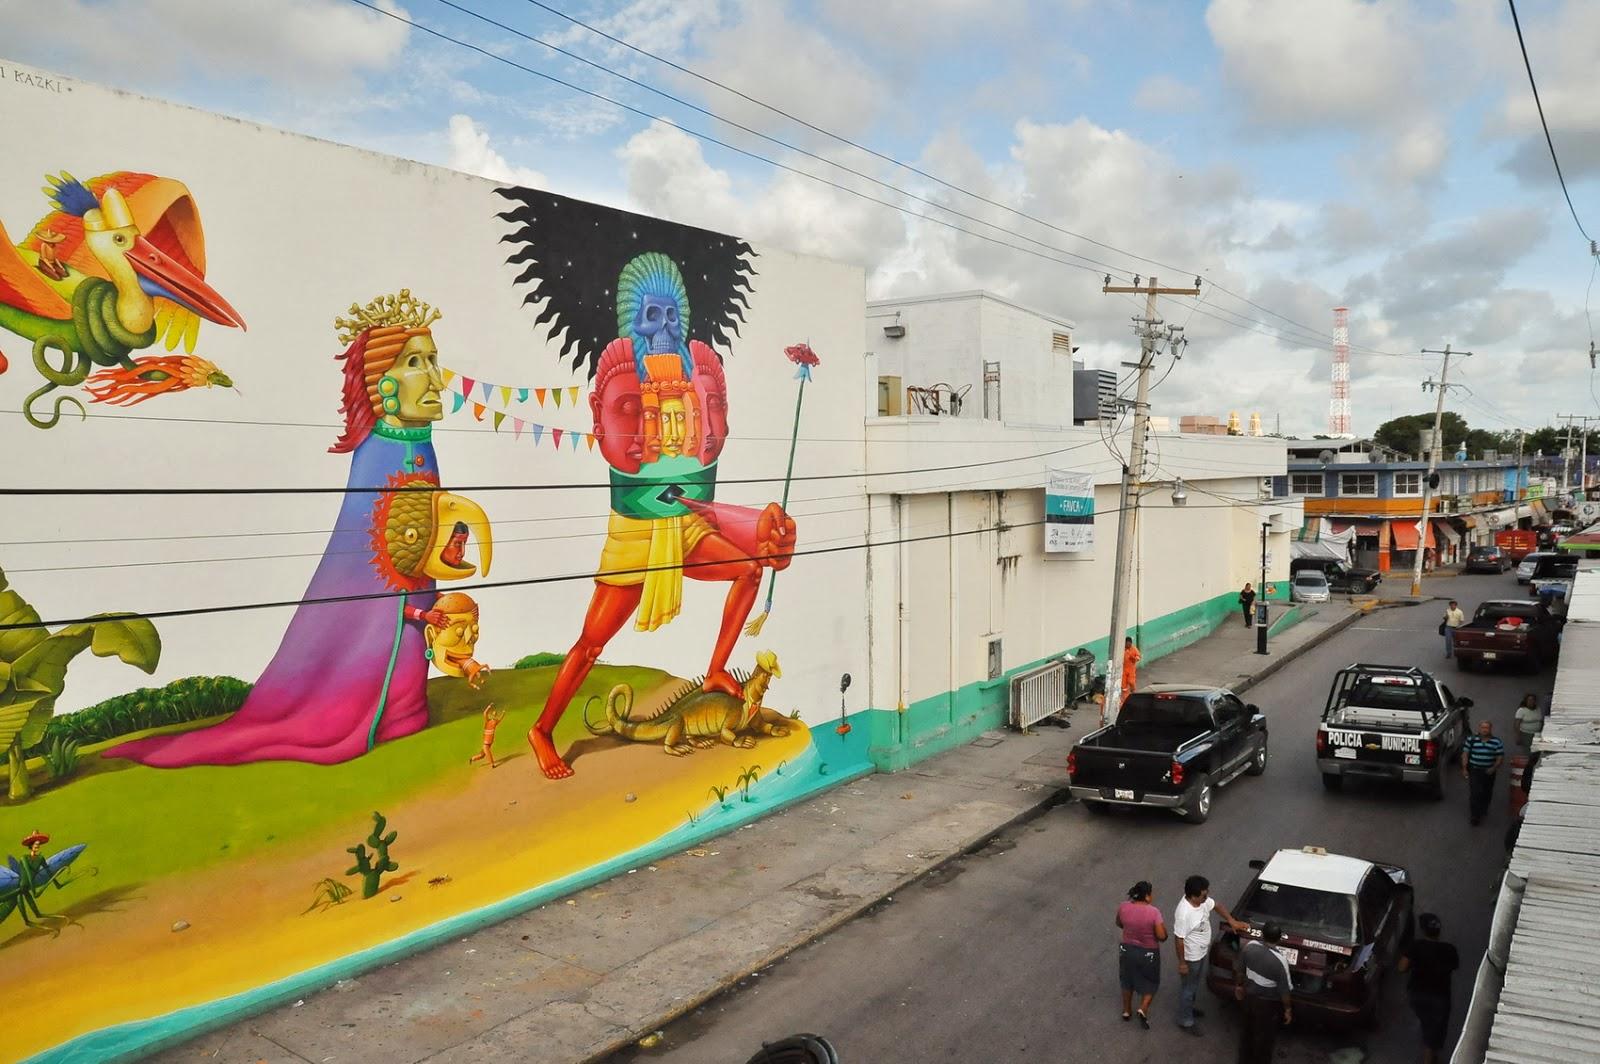 interesni-kazki-new-mural-campeche-mexico-23